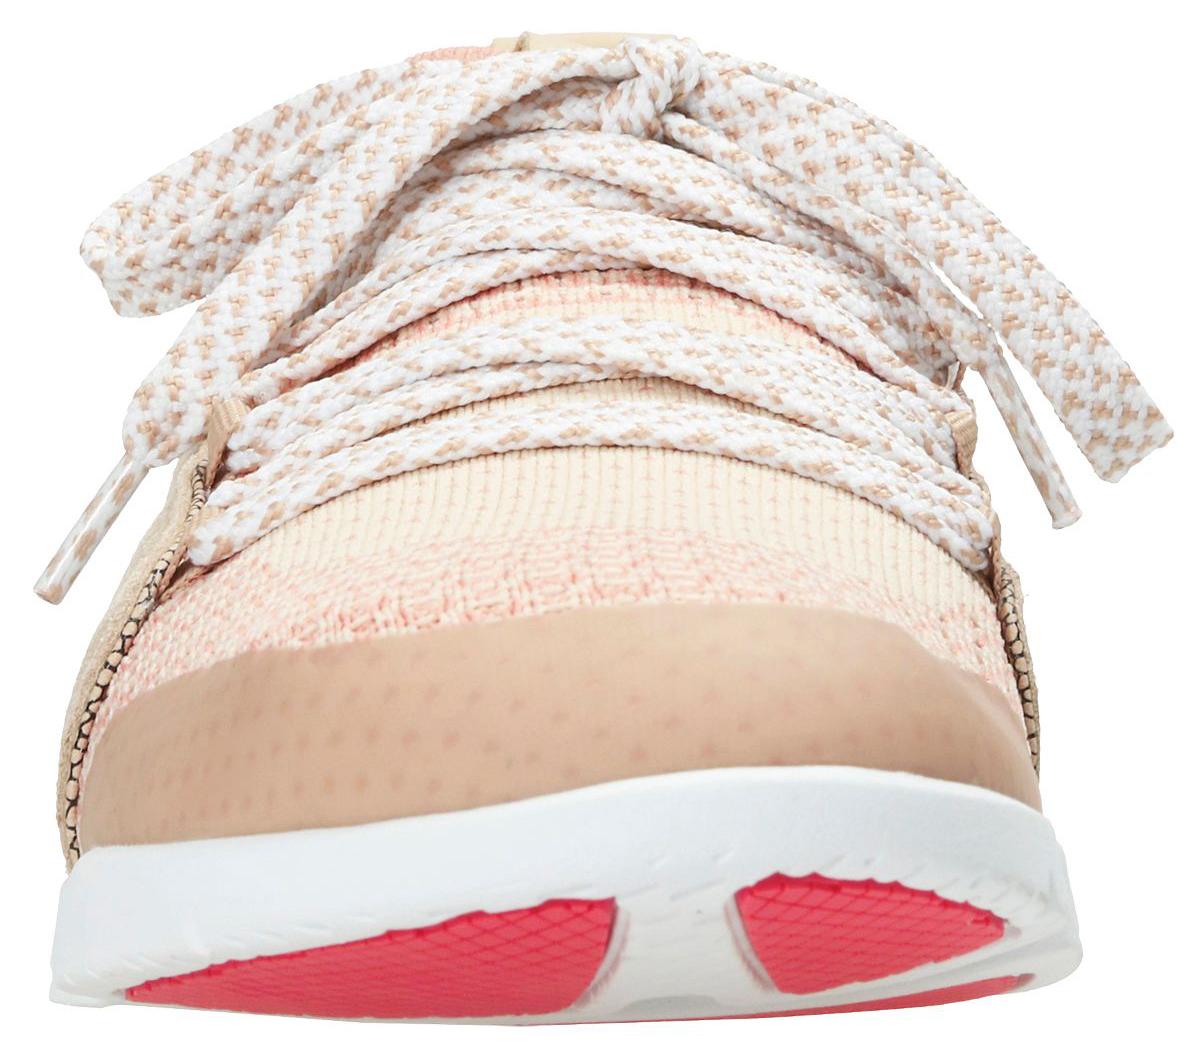 0dbe45b45b Clarks Tri Amelia Shoes - Women's | MEC